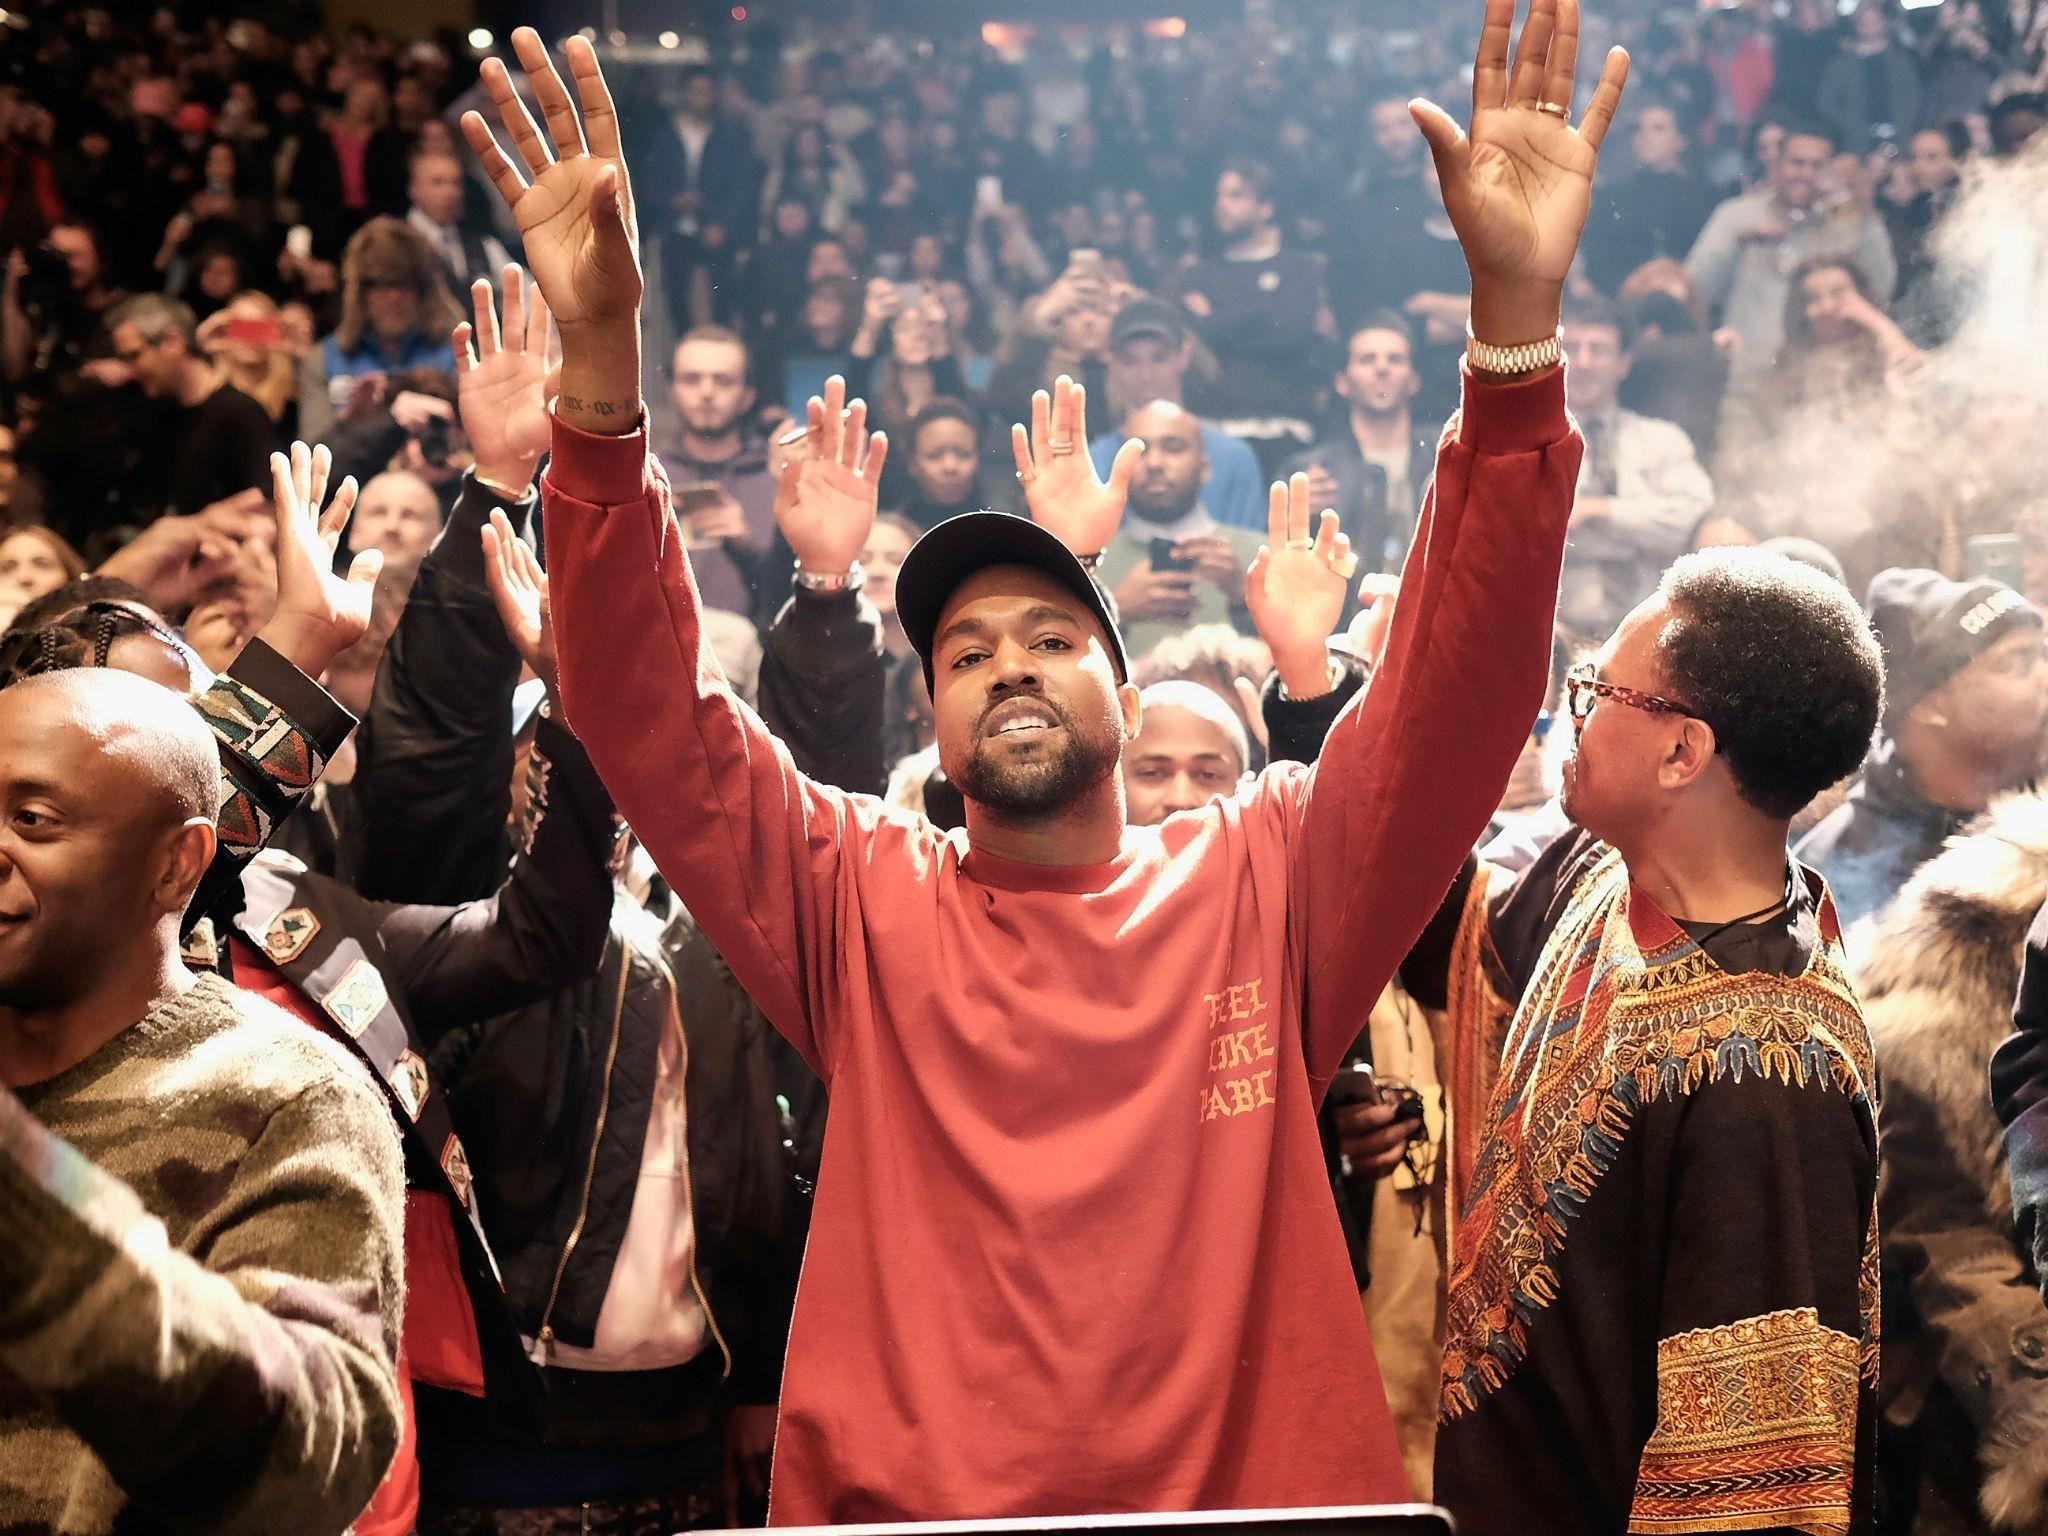 Kanye West Pablo Wallpapers Hd Desktop Wallpaper Box Kanye West Yeezy Season Kanye